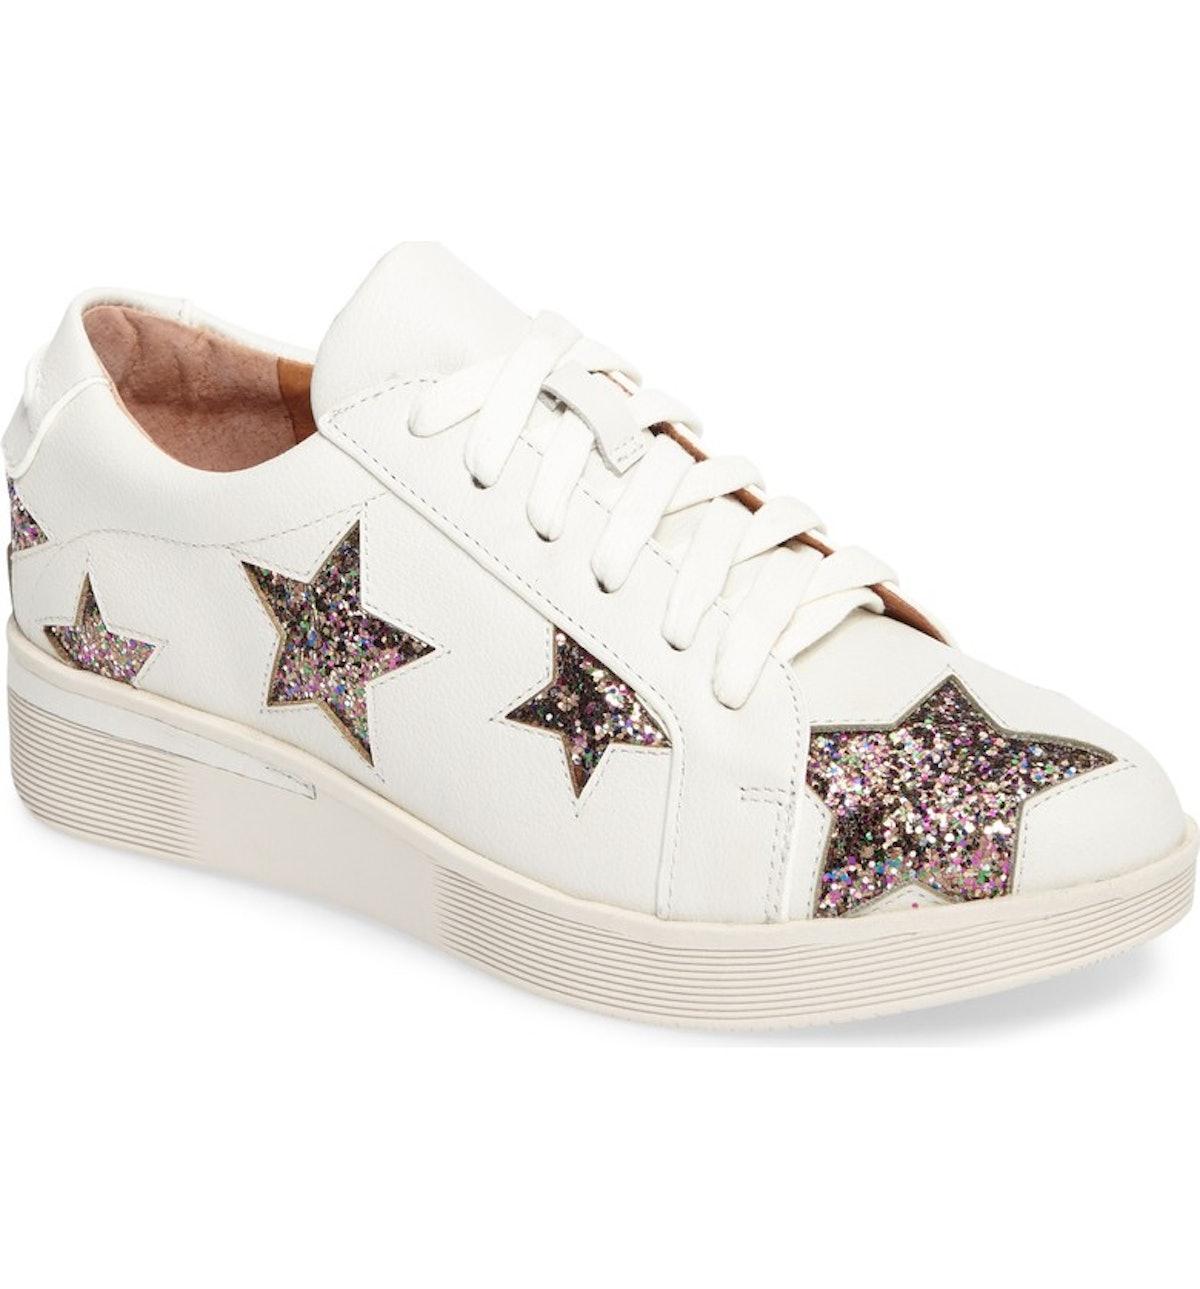 GENTLE SOULS by Kenneth Cole Haddie Star Sneaker